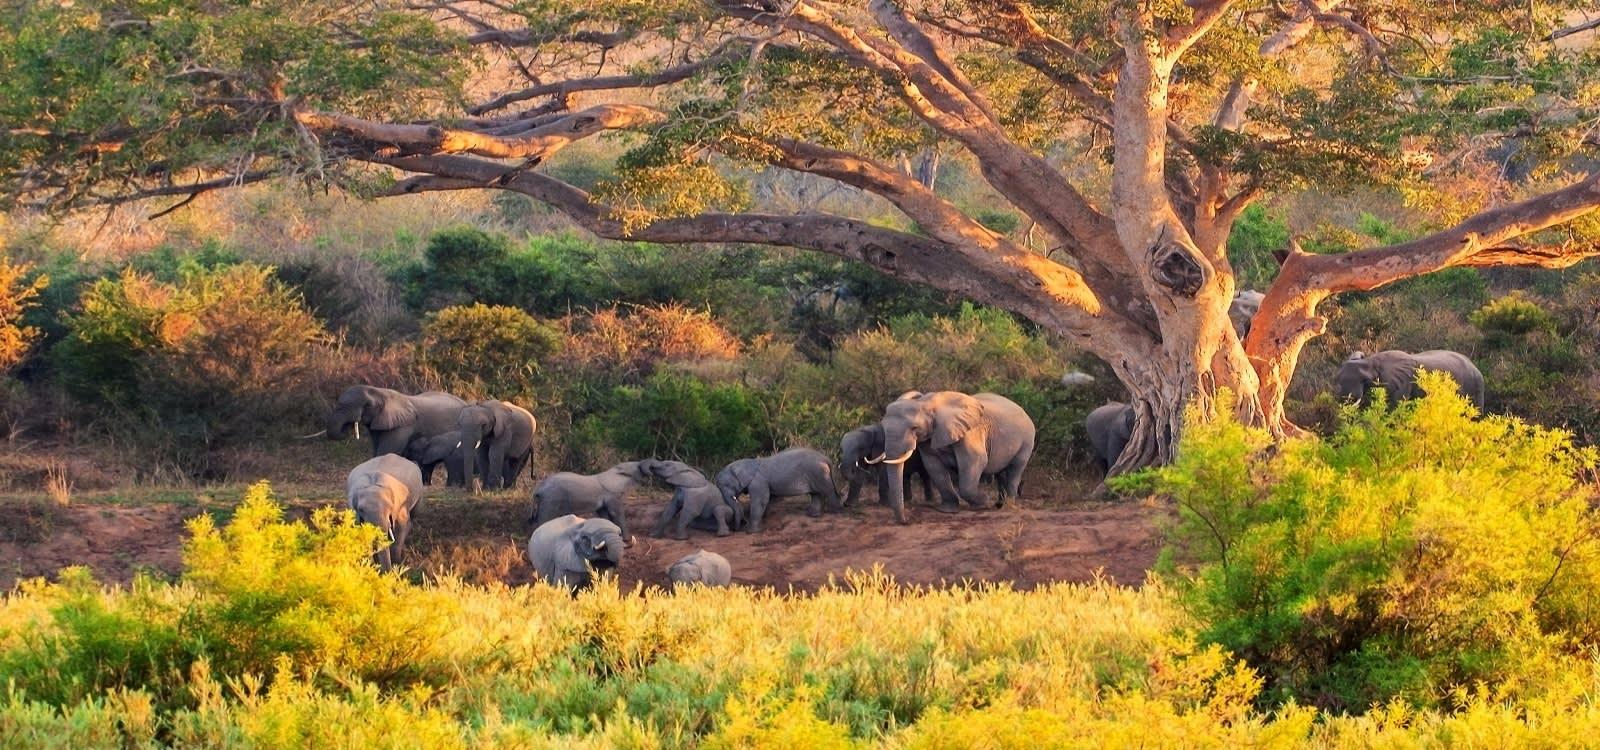 Elefanten im Krüger Nationalpark